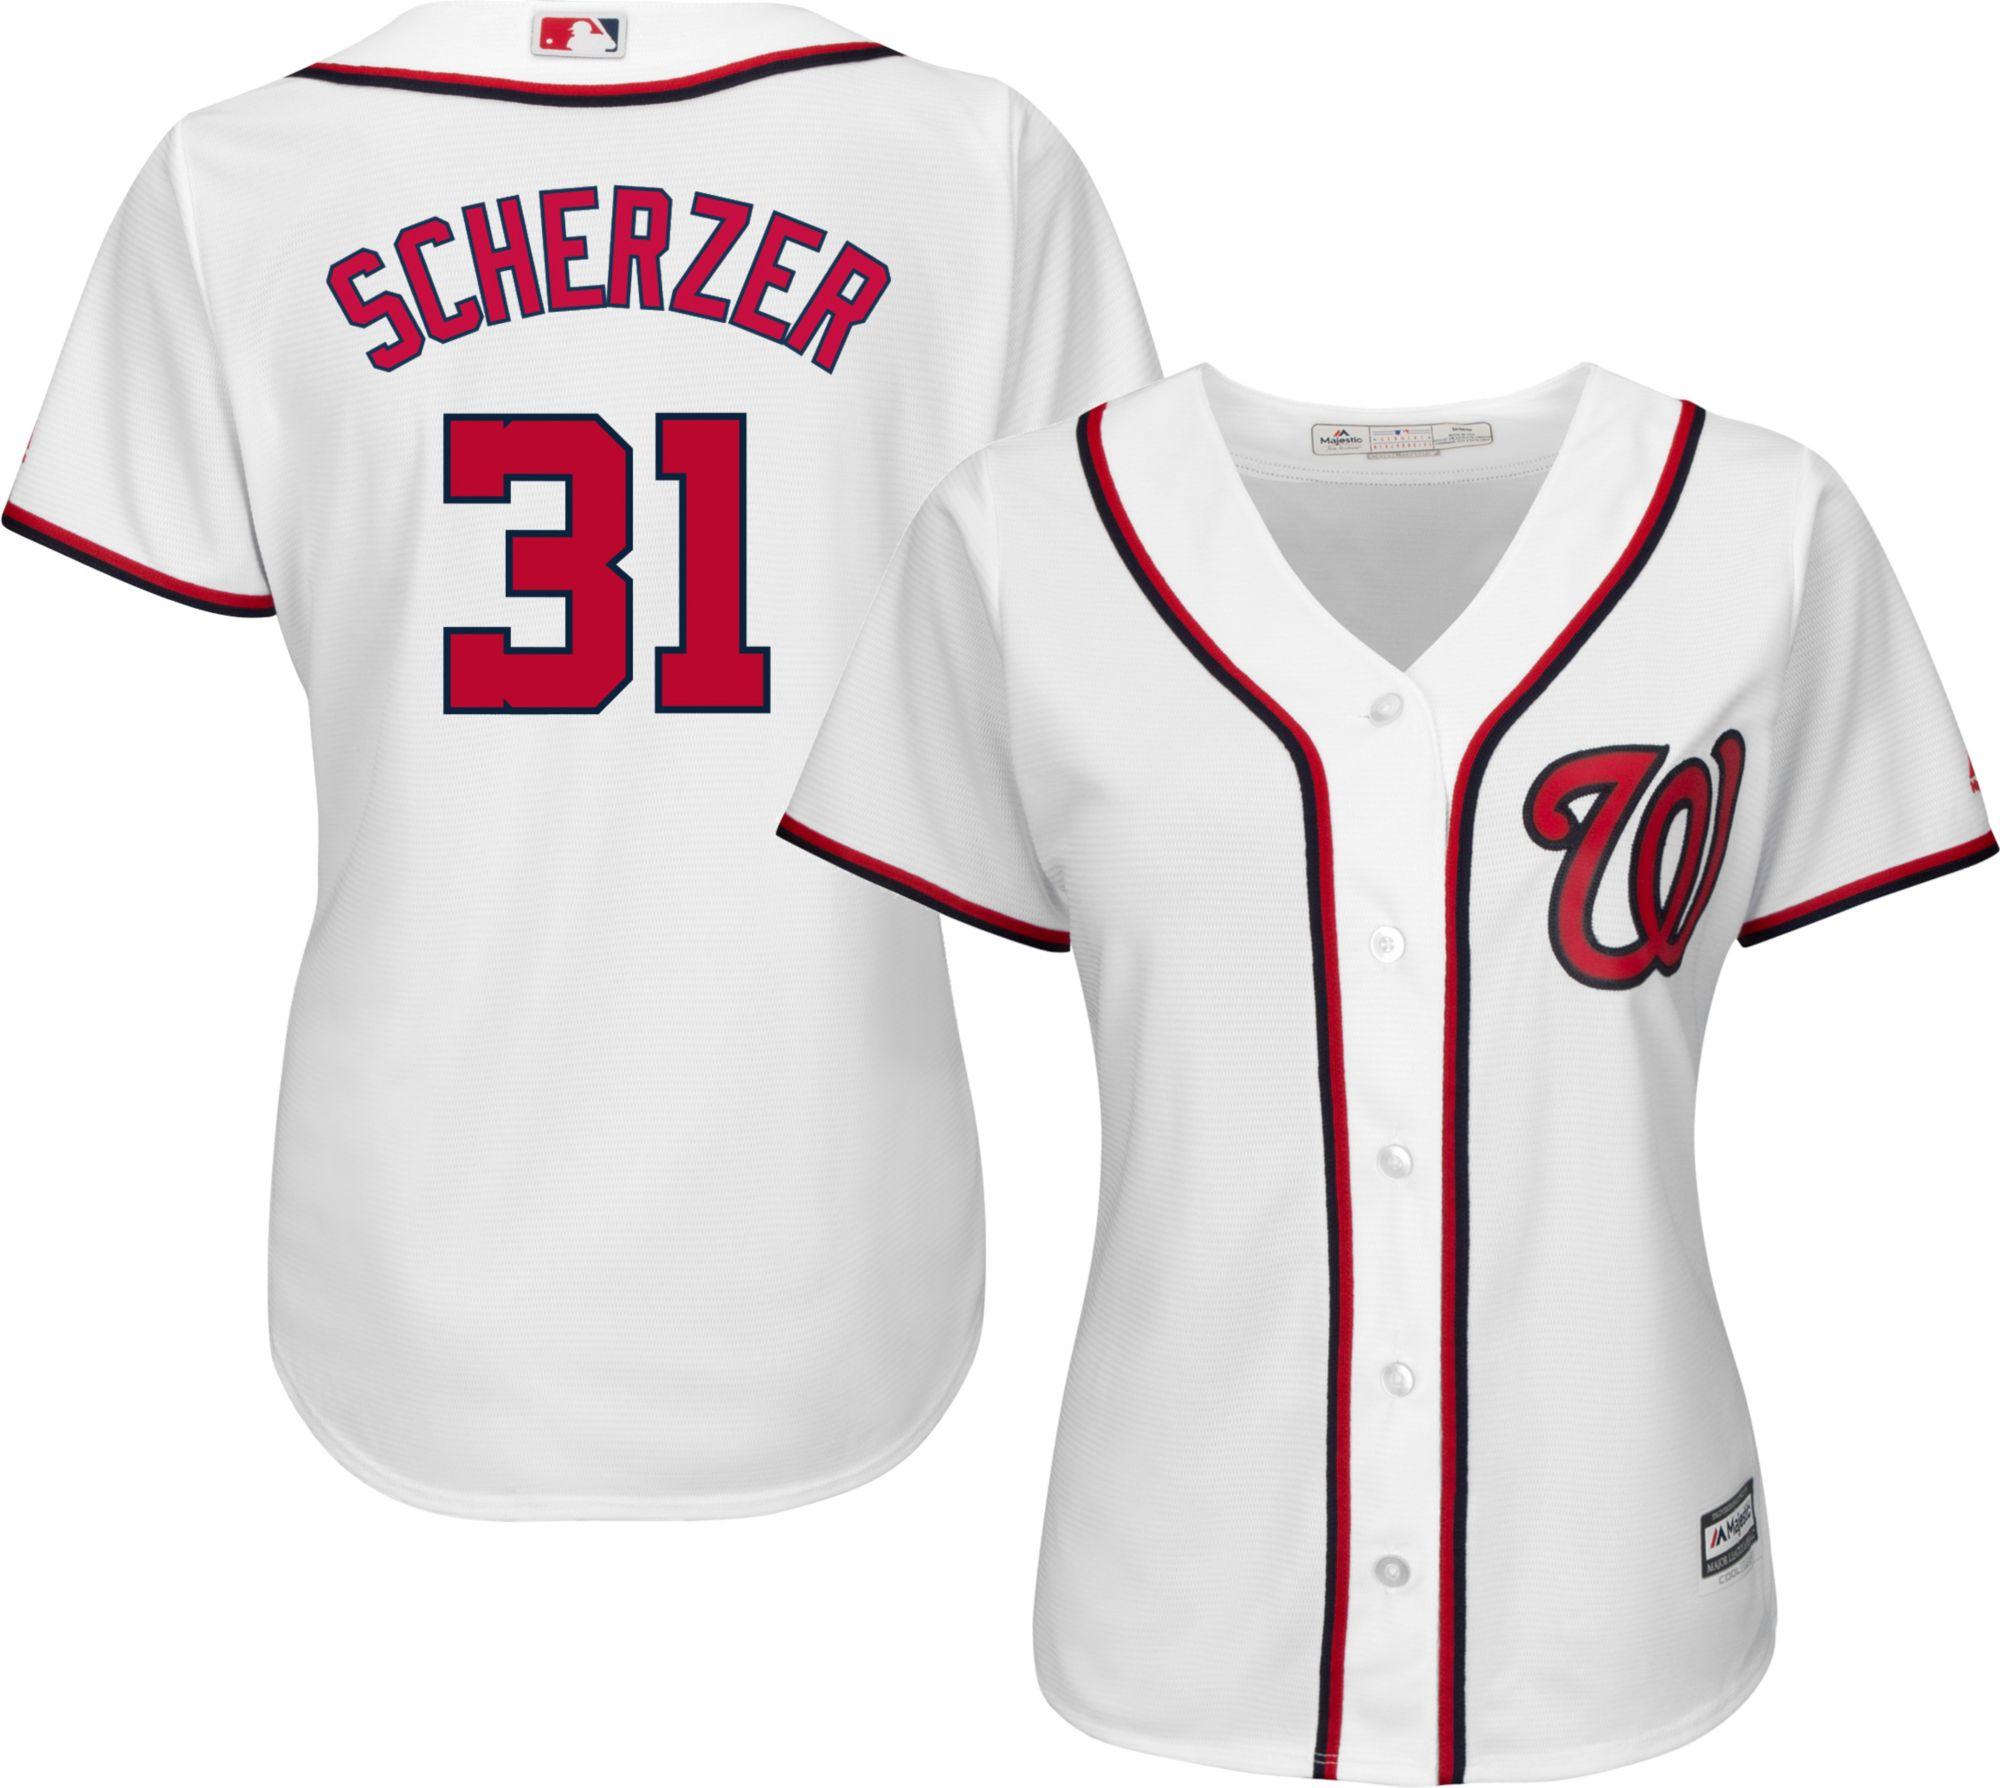 59d2b994662 ... where to buy majestic womens replica washington nationals max scherzer  31 cool base home white jersey